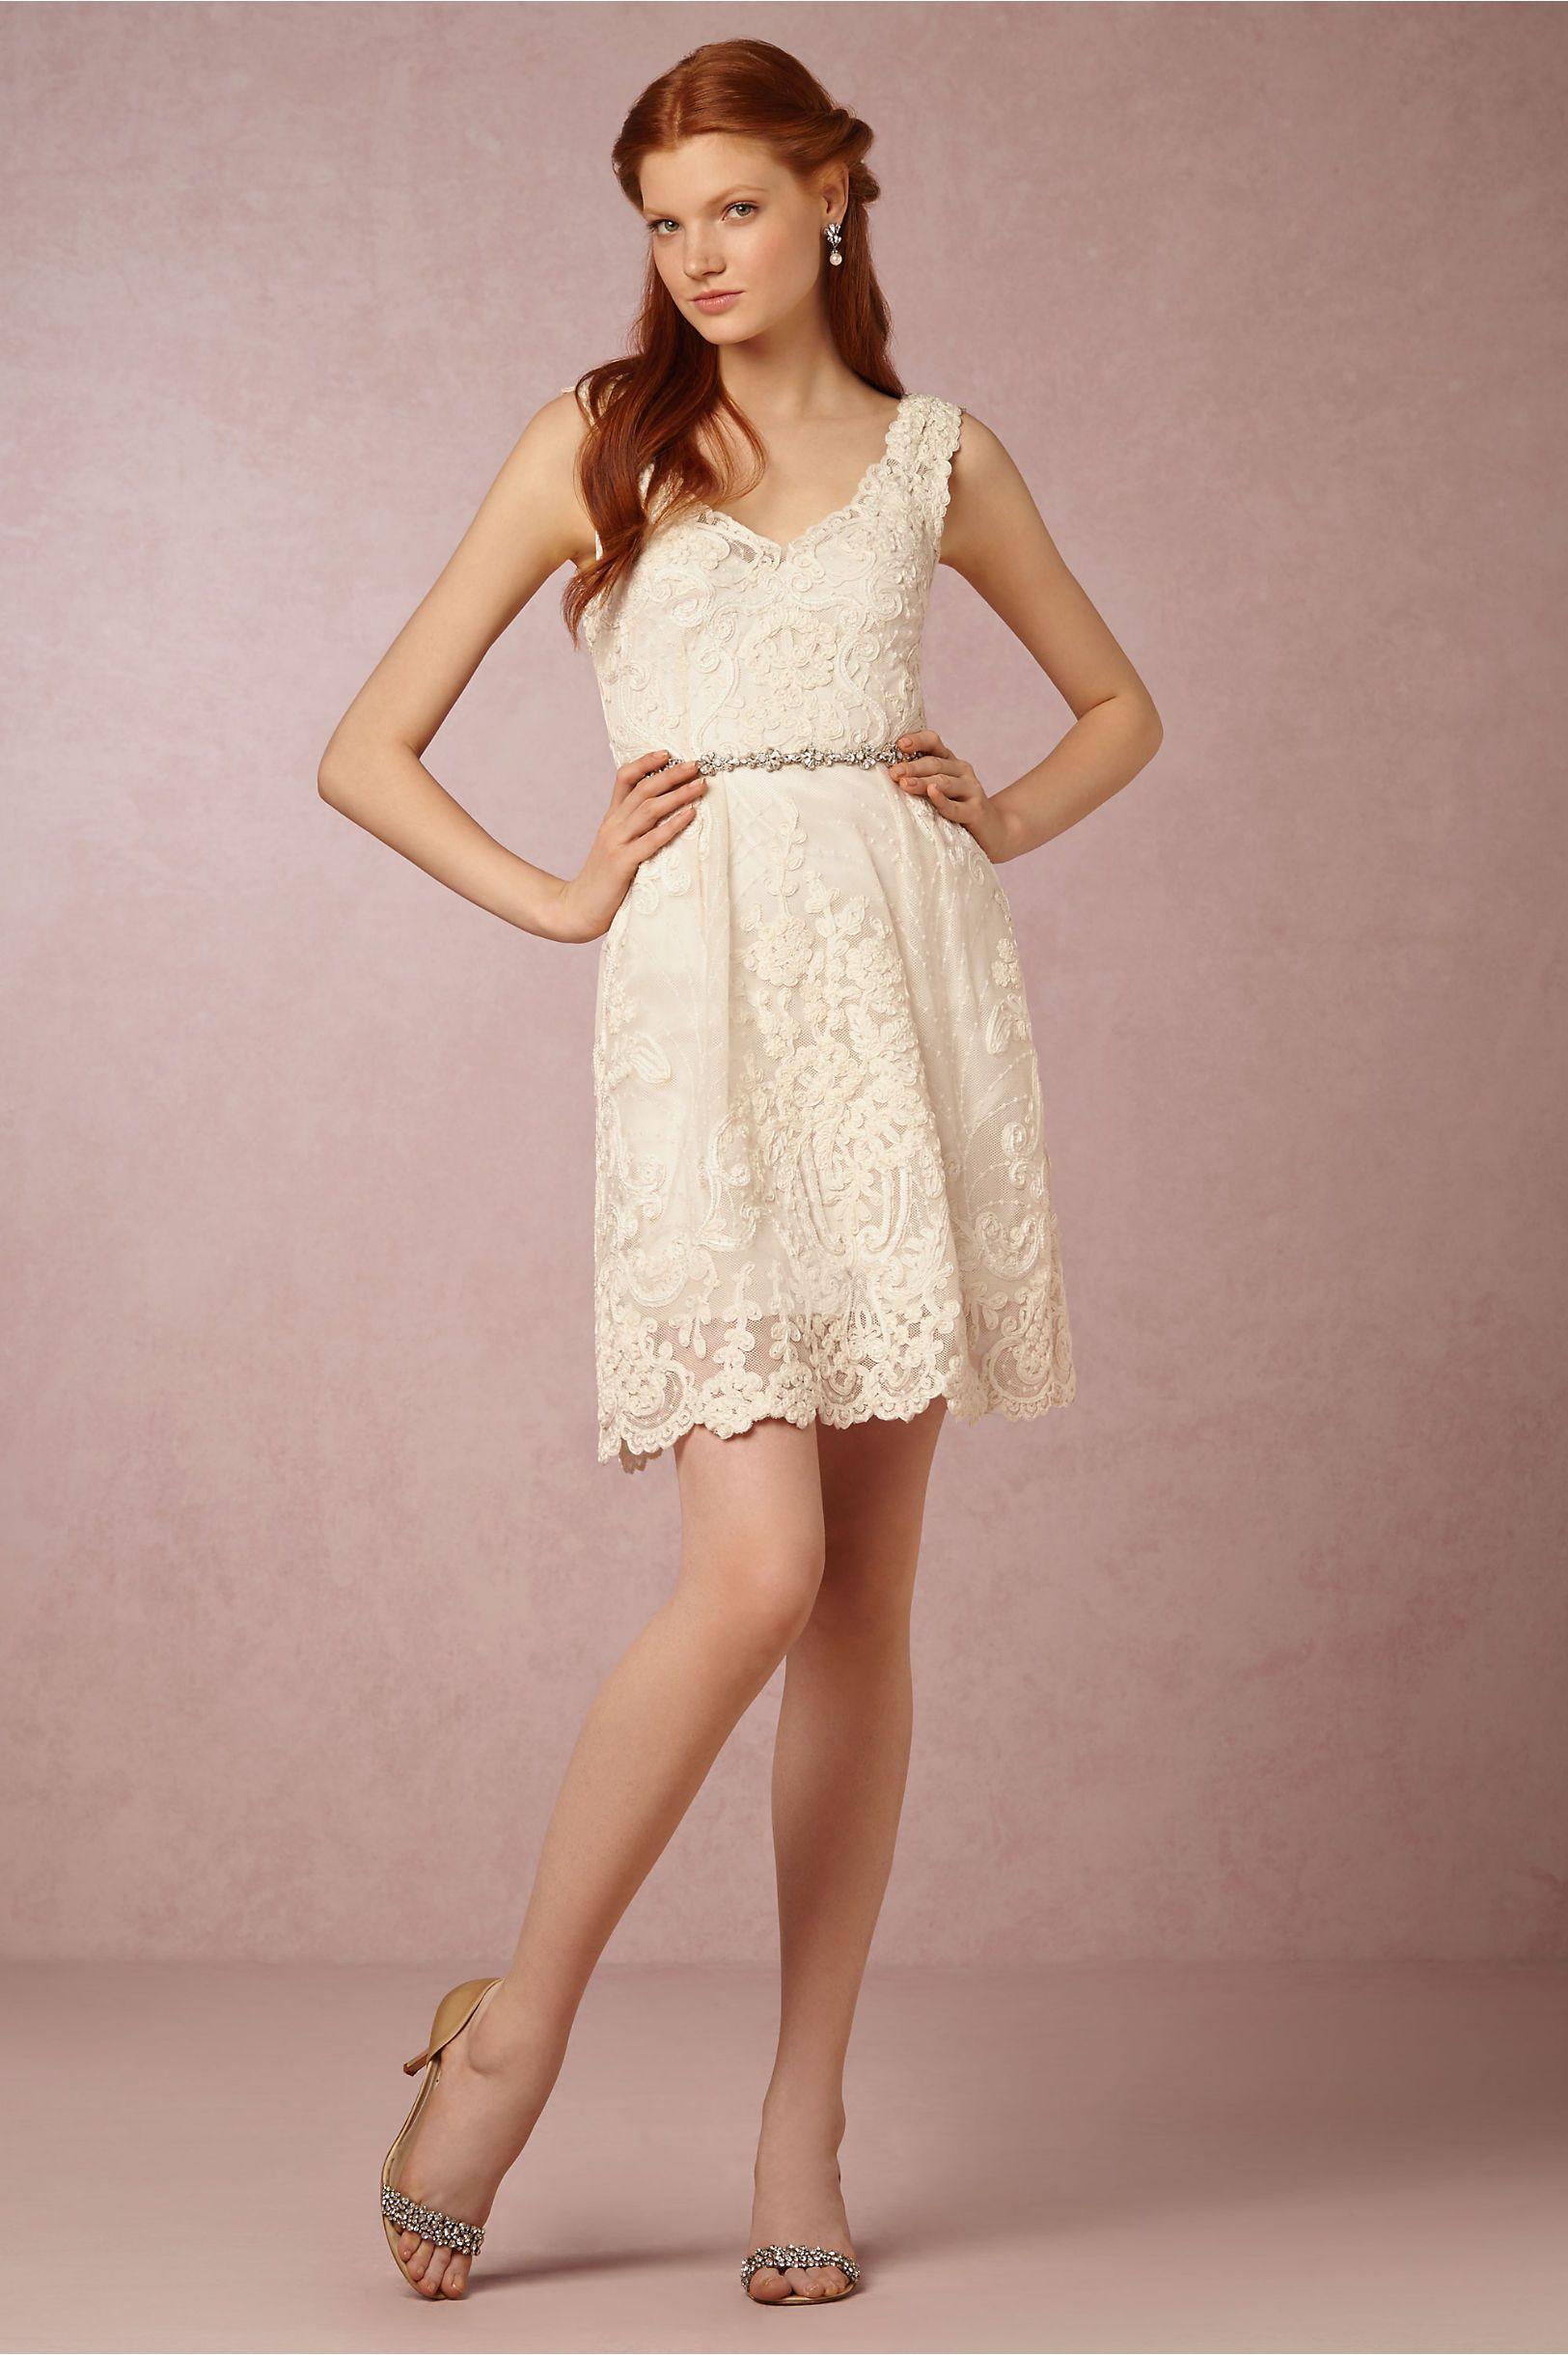 little white reception or bridal shower dress alexandra dress from bhldn bride reception dresses